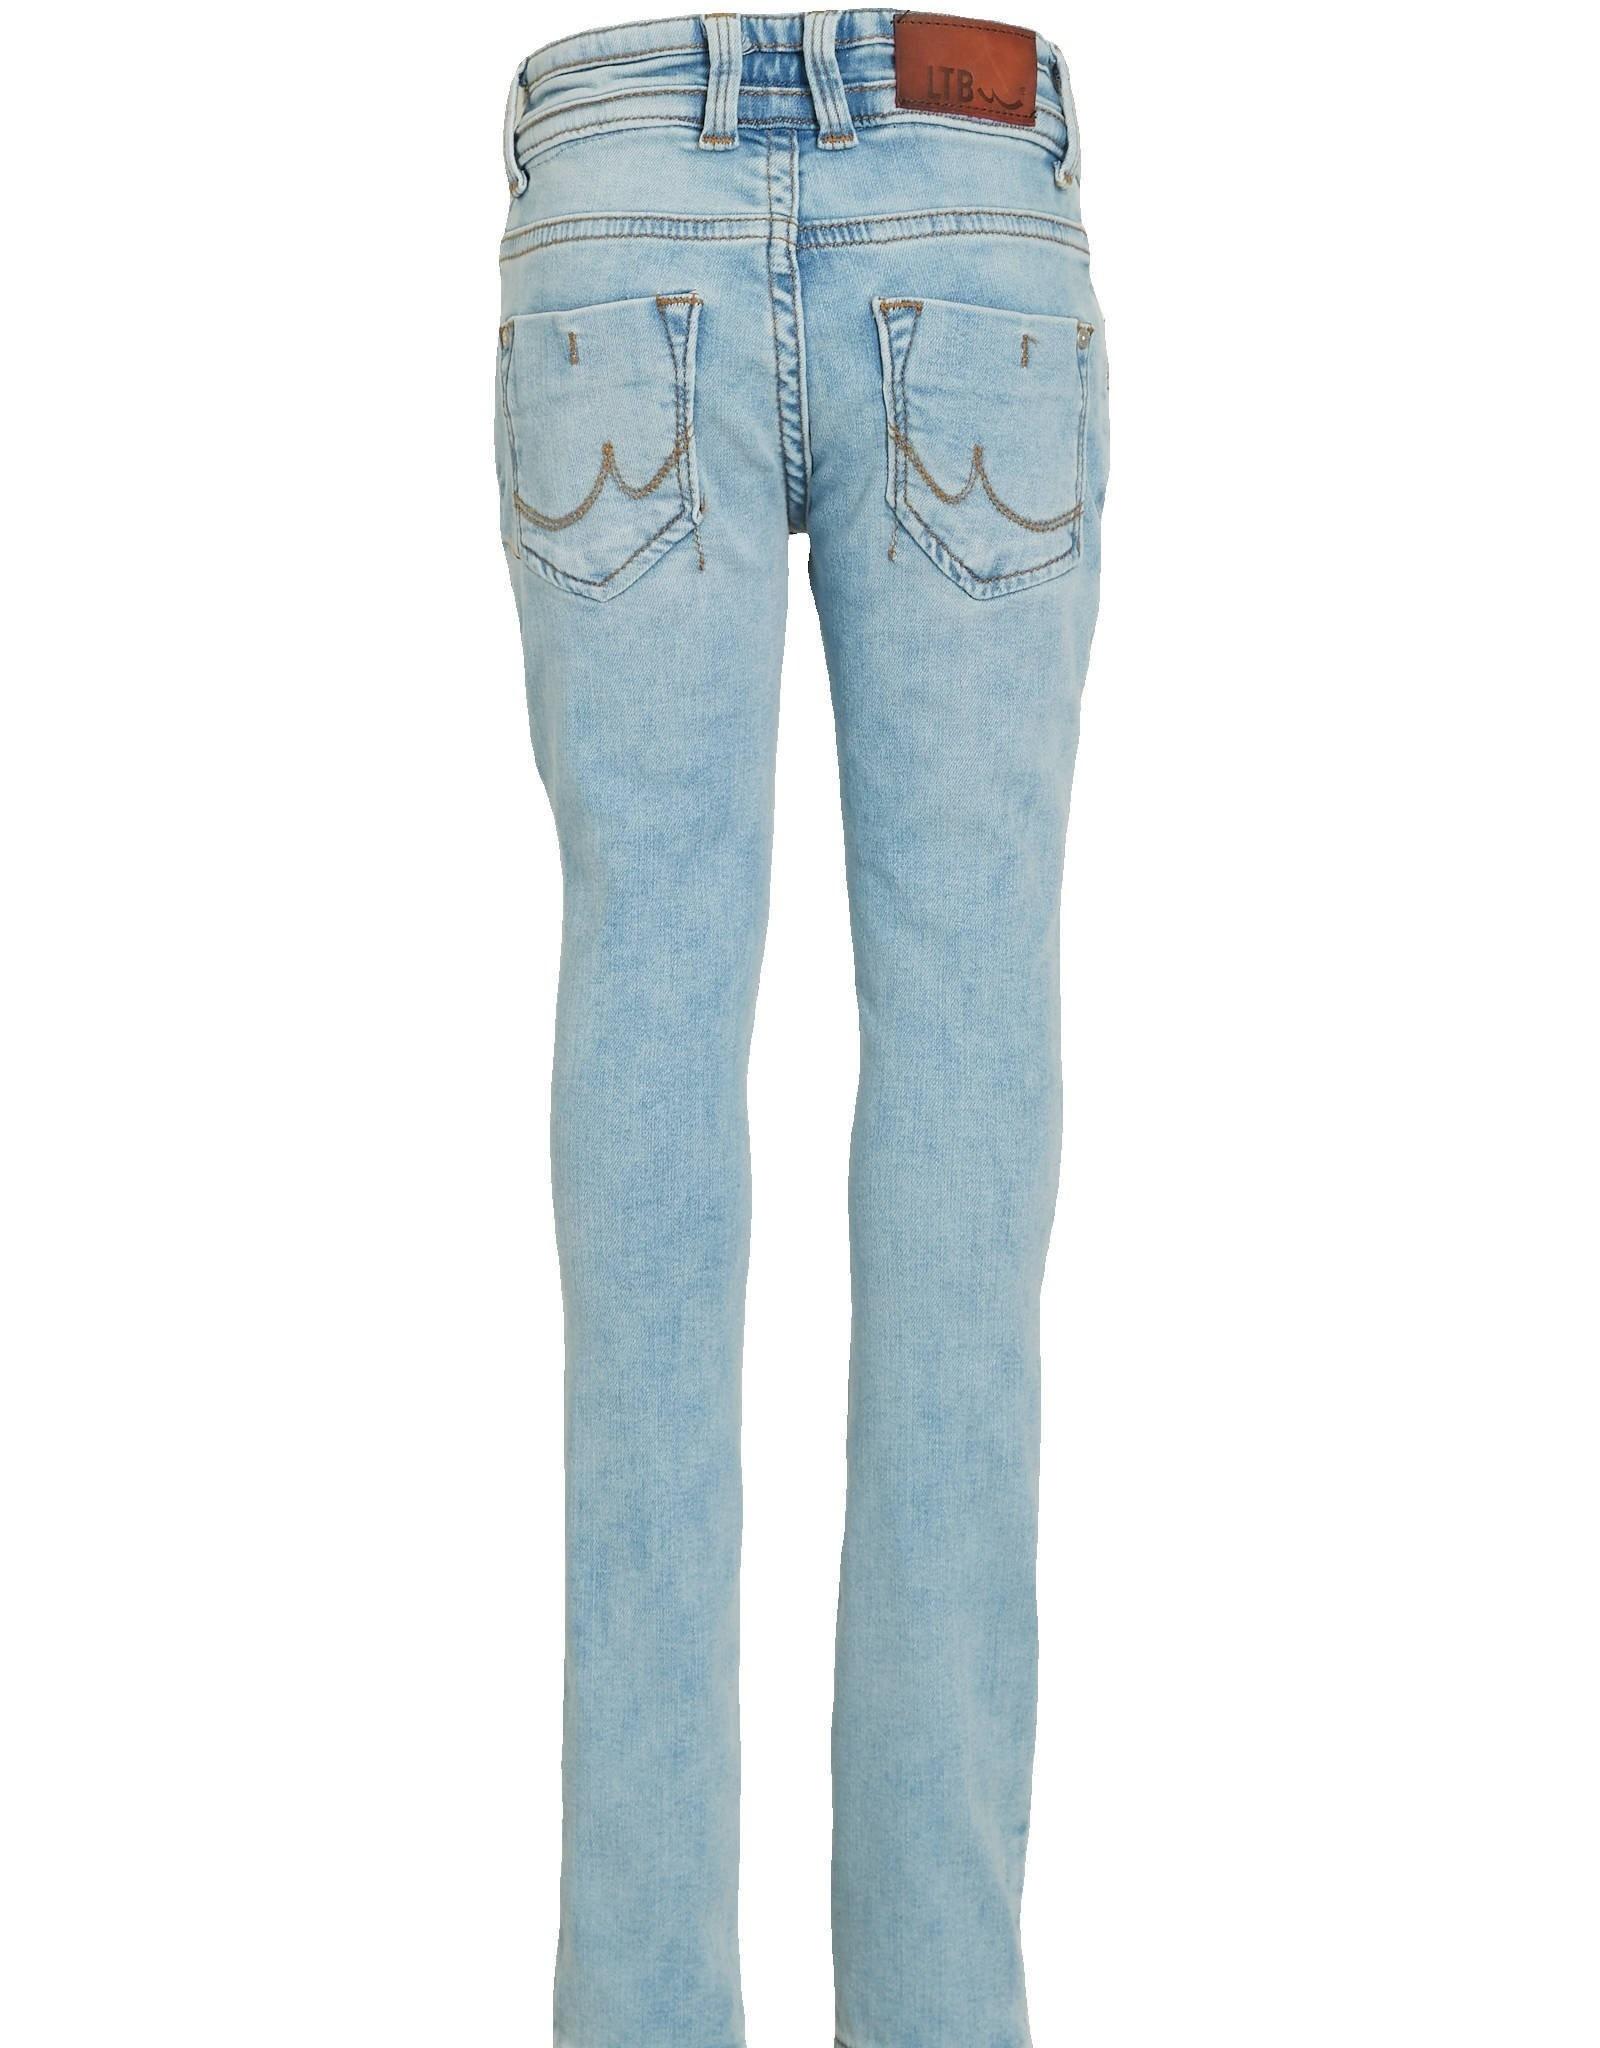 LTB Jeans LTB meisjes jeans Julita Leilani wash